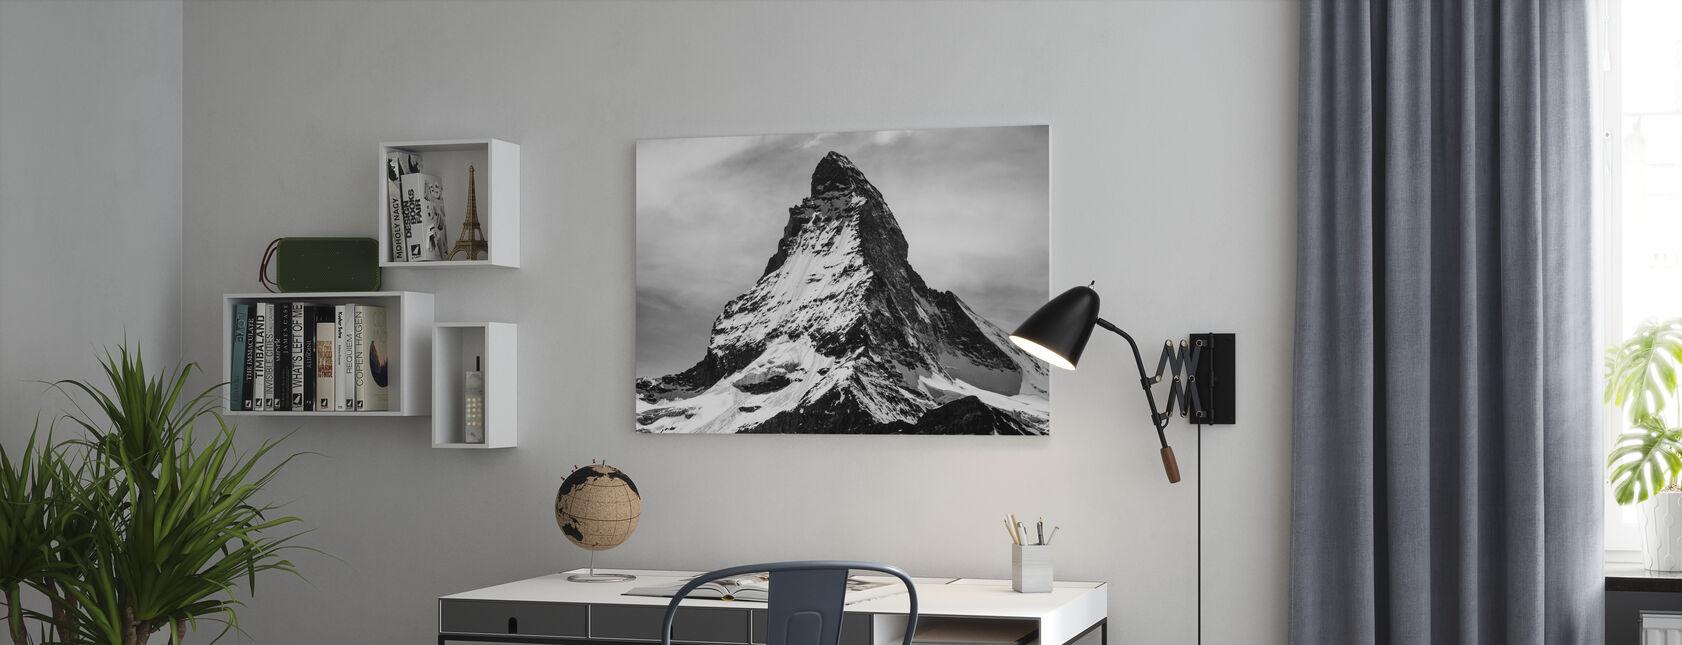 Mountain Top - Canvas print - Office